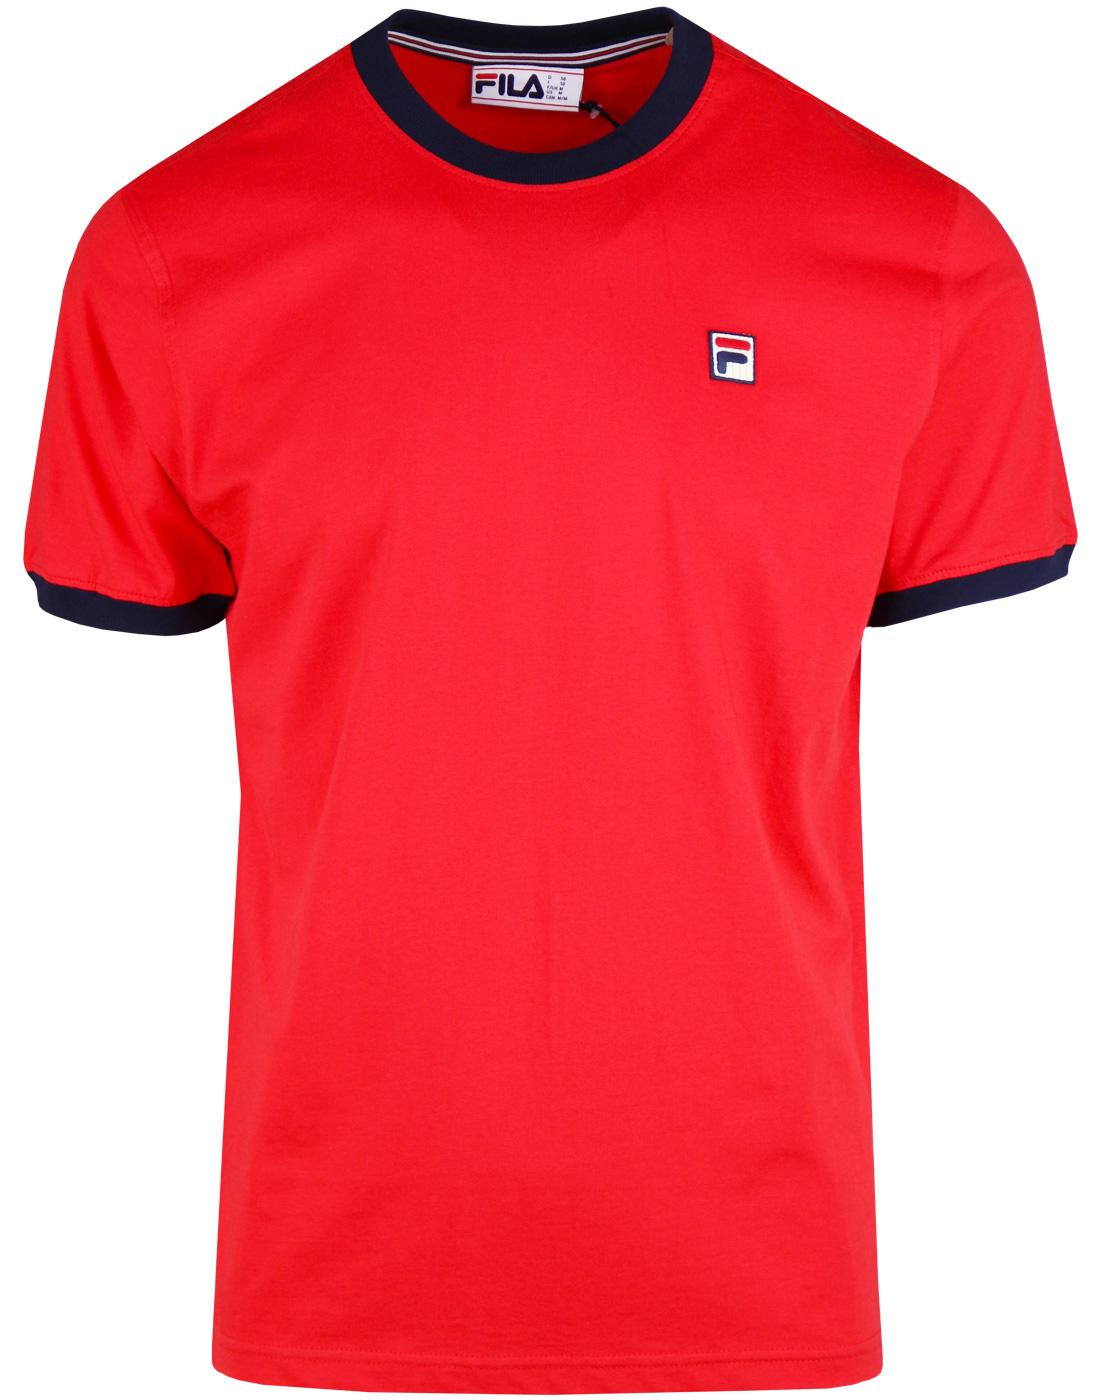 Marconi FILA VINTAGE Retro 70s Ringer T-Shirt (CR)